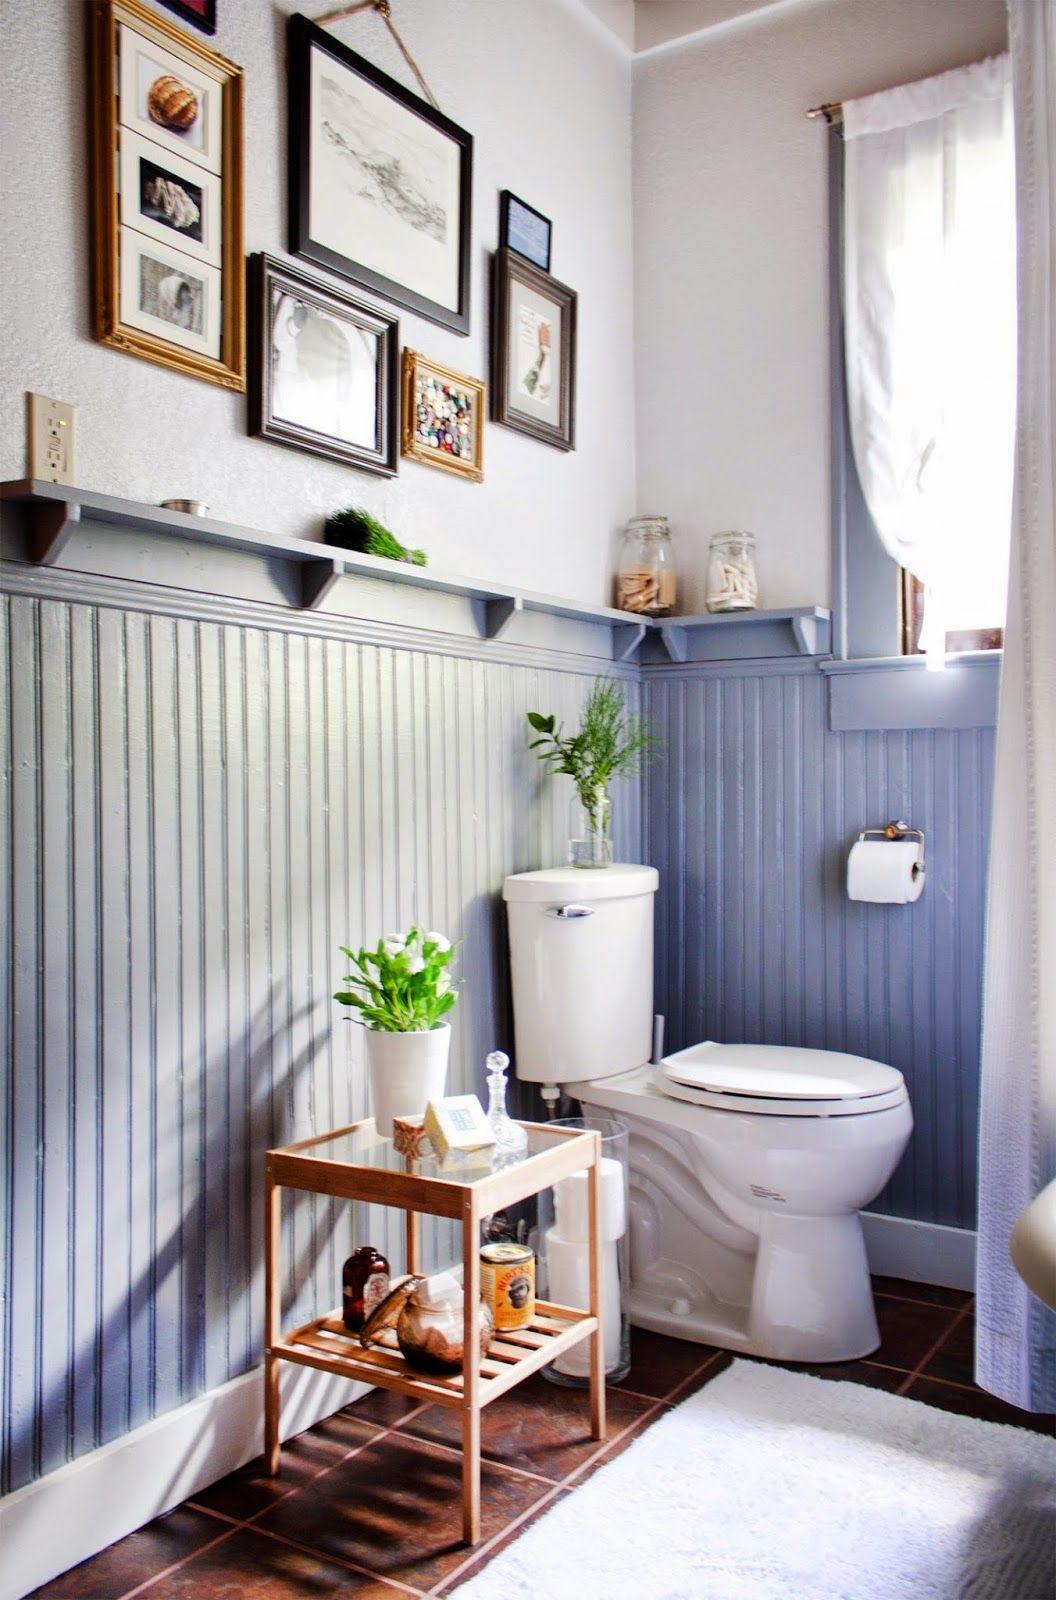 Badezimmer ideen mit wanne lavabos uma breve história  diversos  pinterest  badezimmer bad